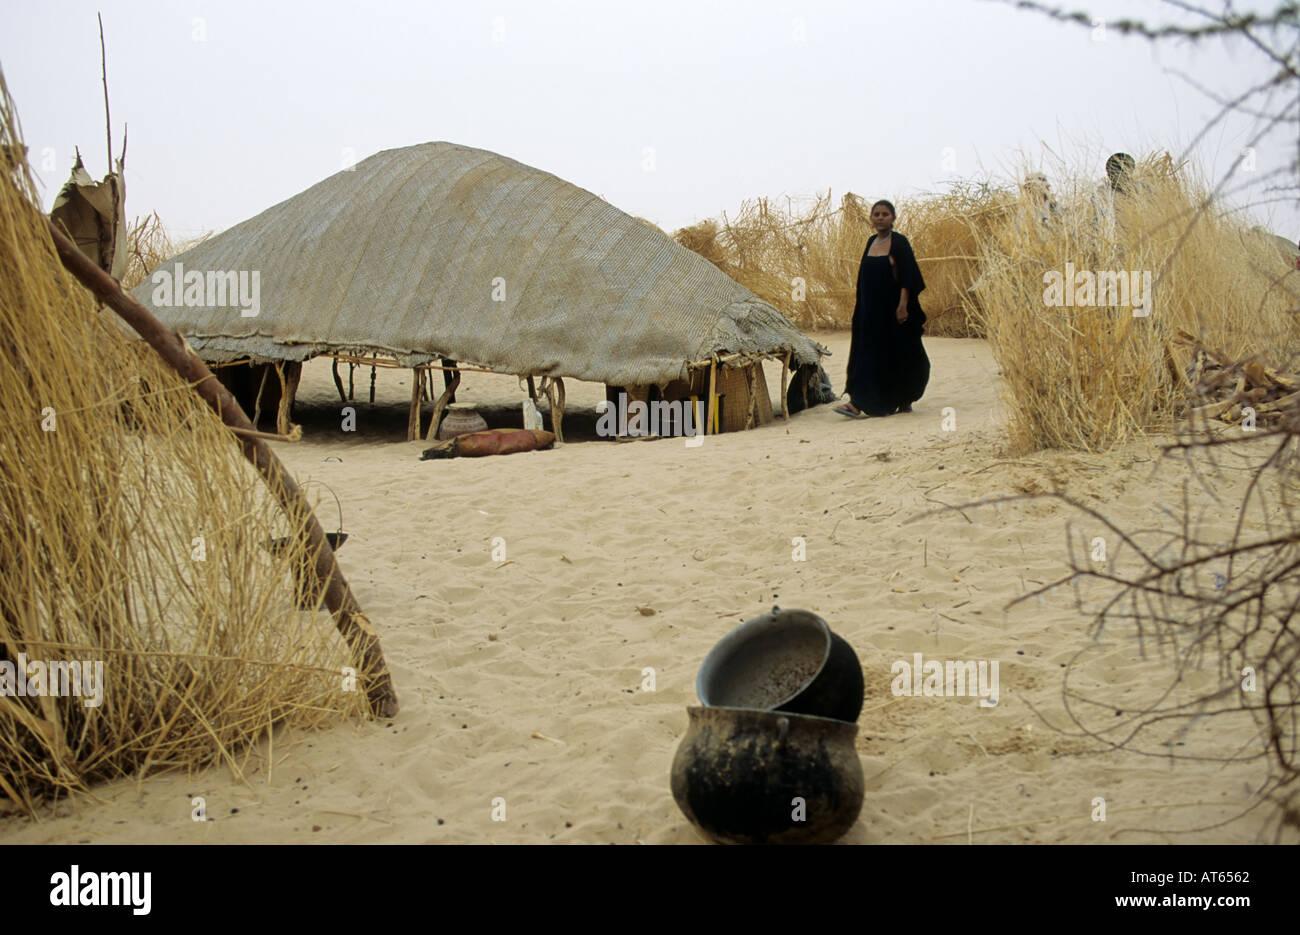 C& touareg Tombouctou (Tombouctou) Mali Photo Stock & Tuareg Tent Photos u0026 Tuareg Tent Images - Alamy